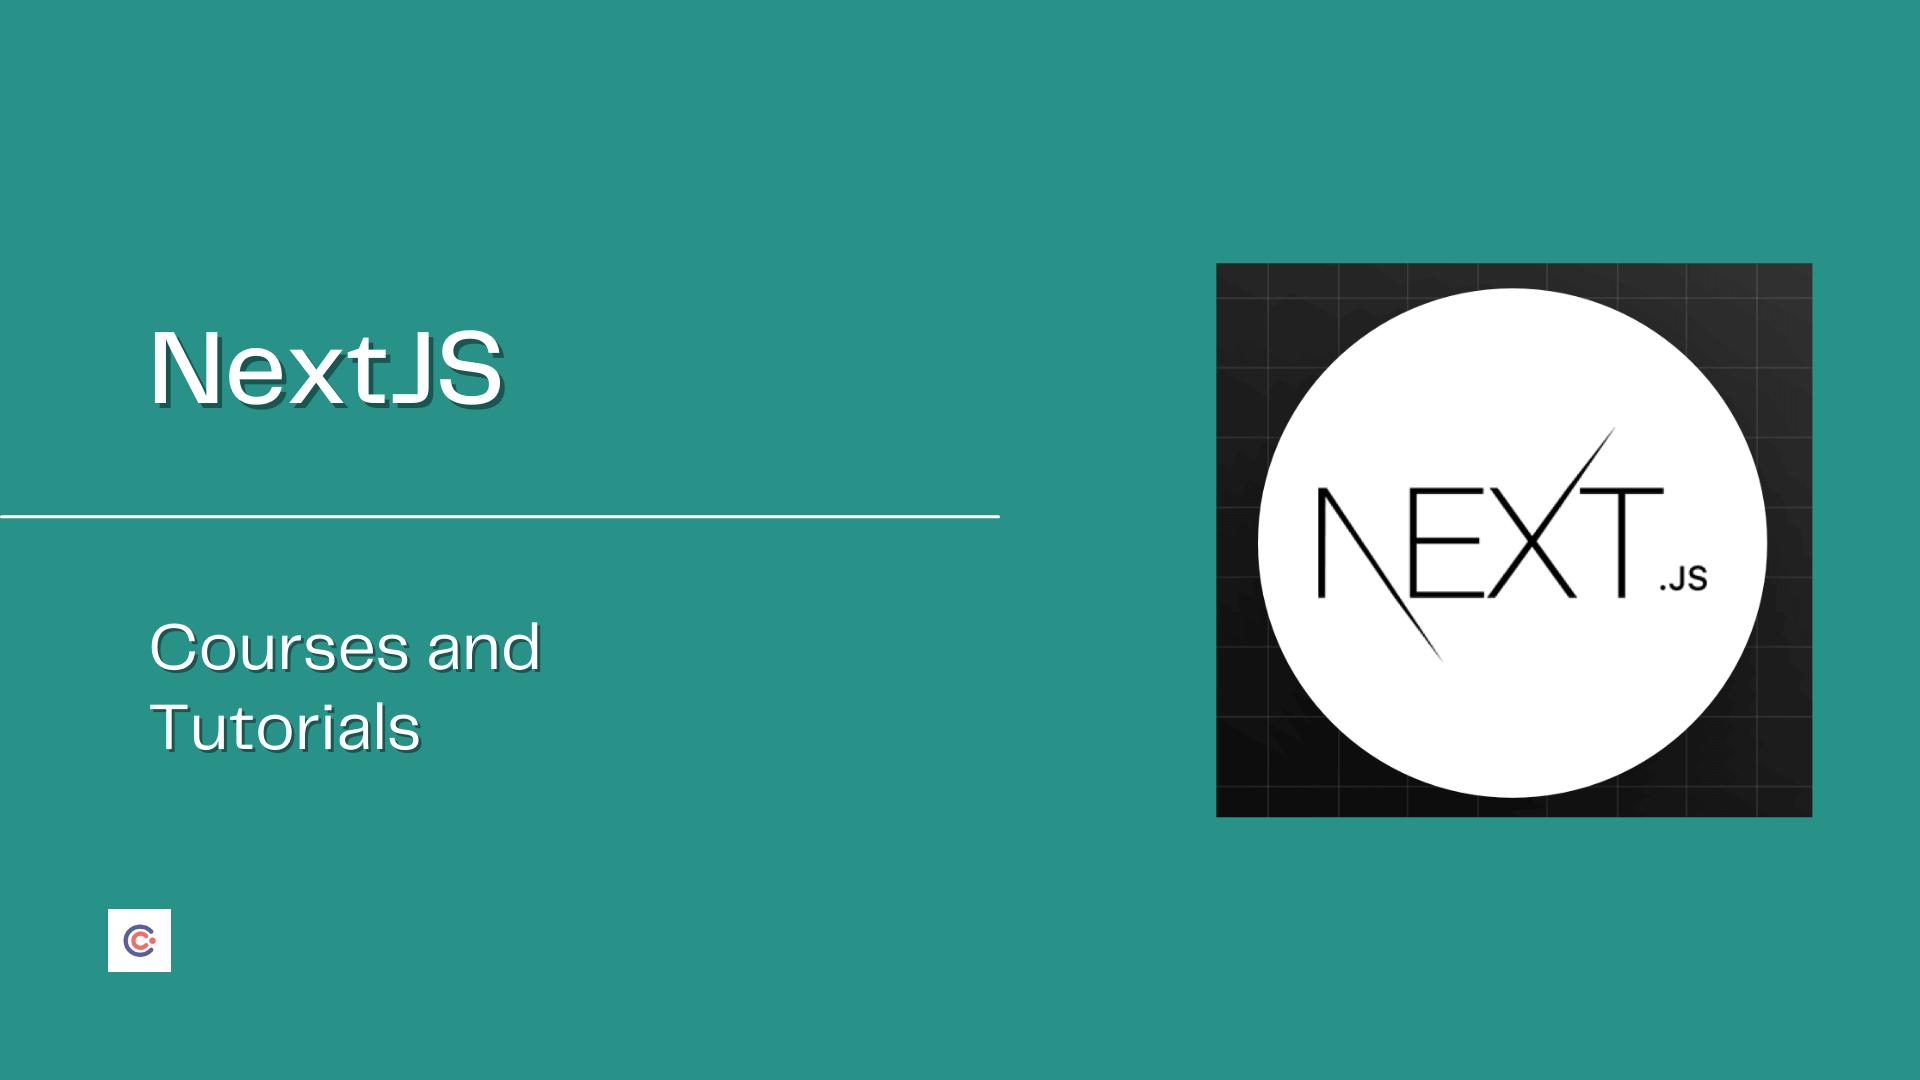 5 Best NextJS Courses and Tutorials - Learn NextJS Online